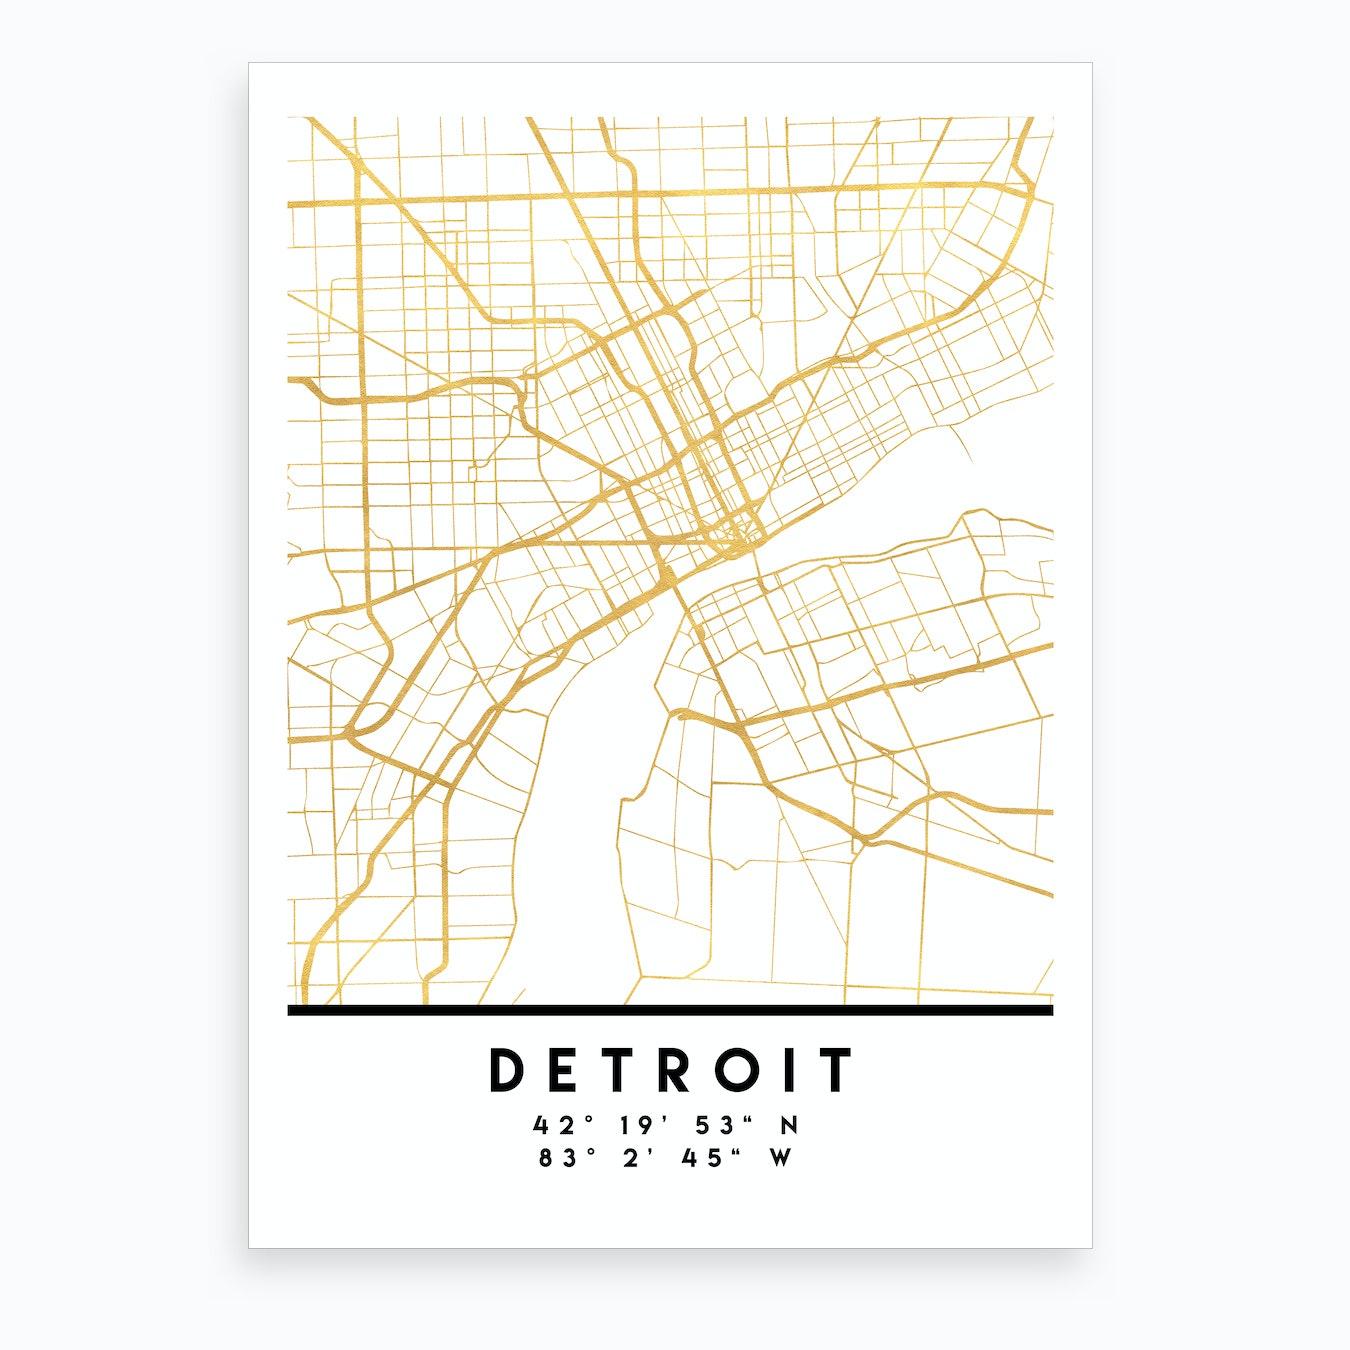 Detroit Michigan City Street Map